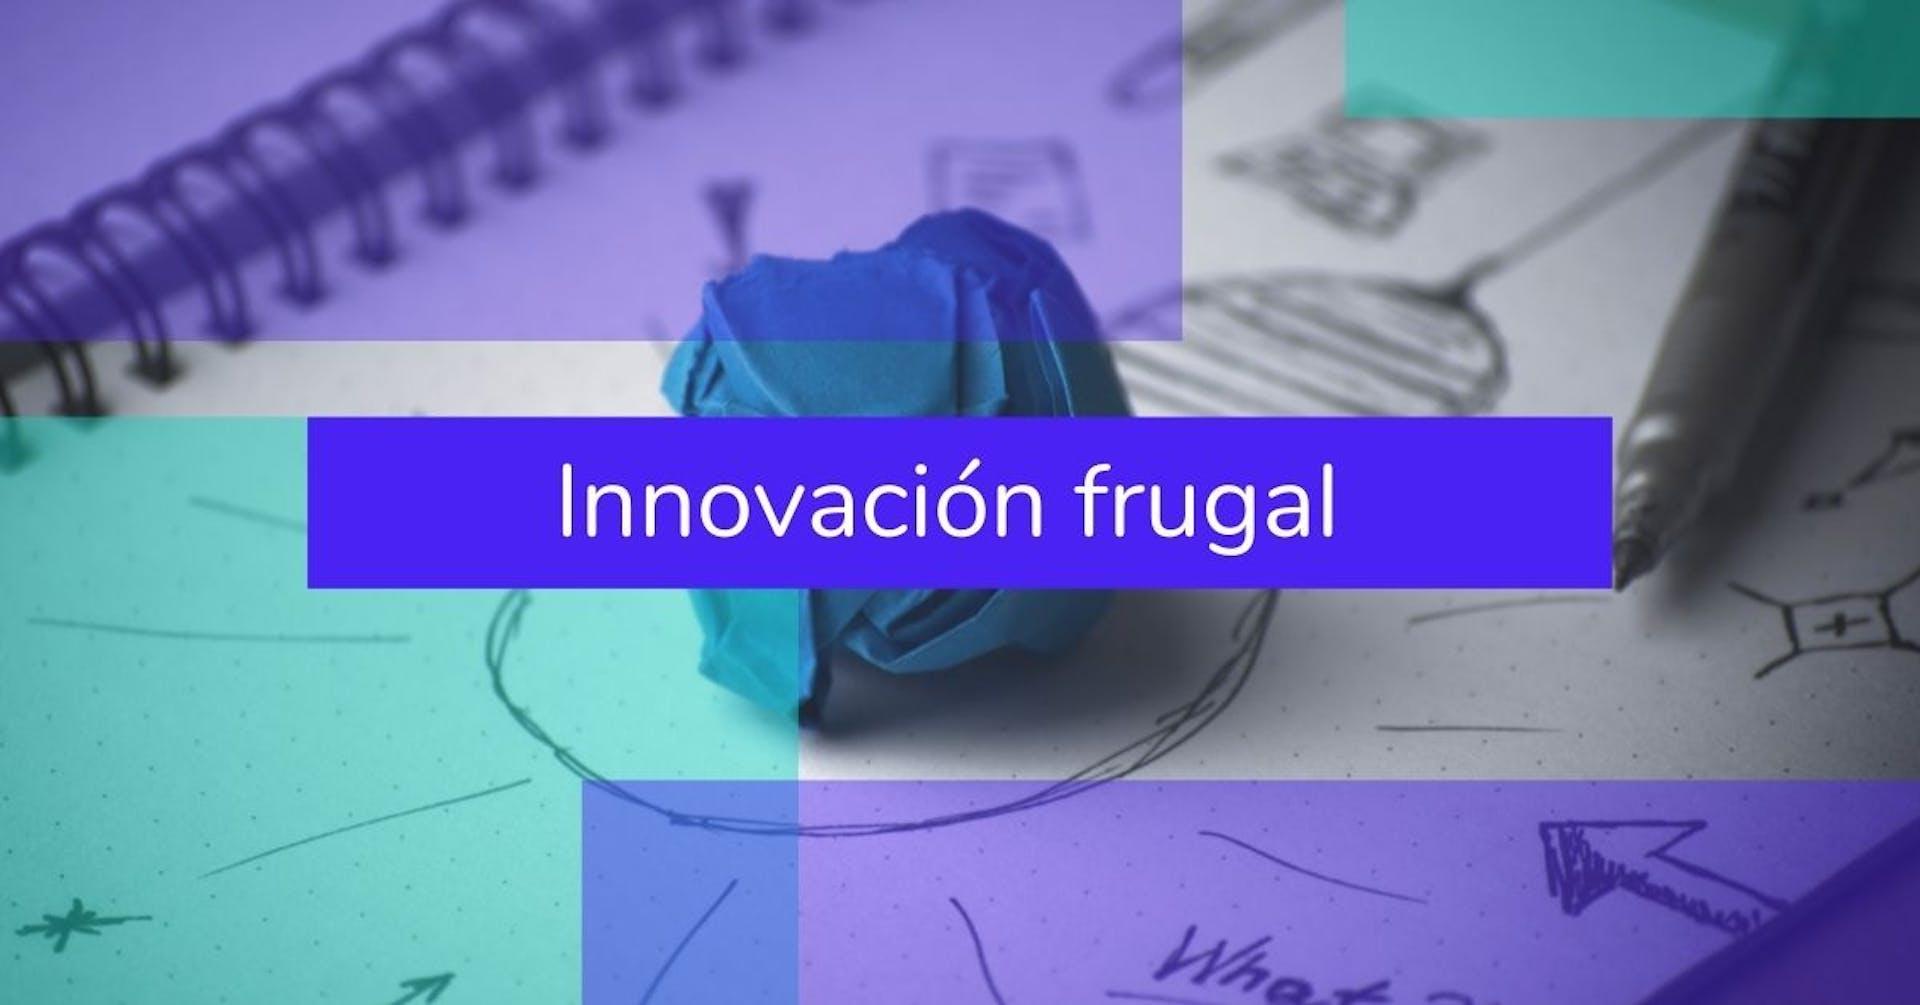 Innovación Frugal: Crea valor en mercados emergentes